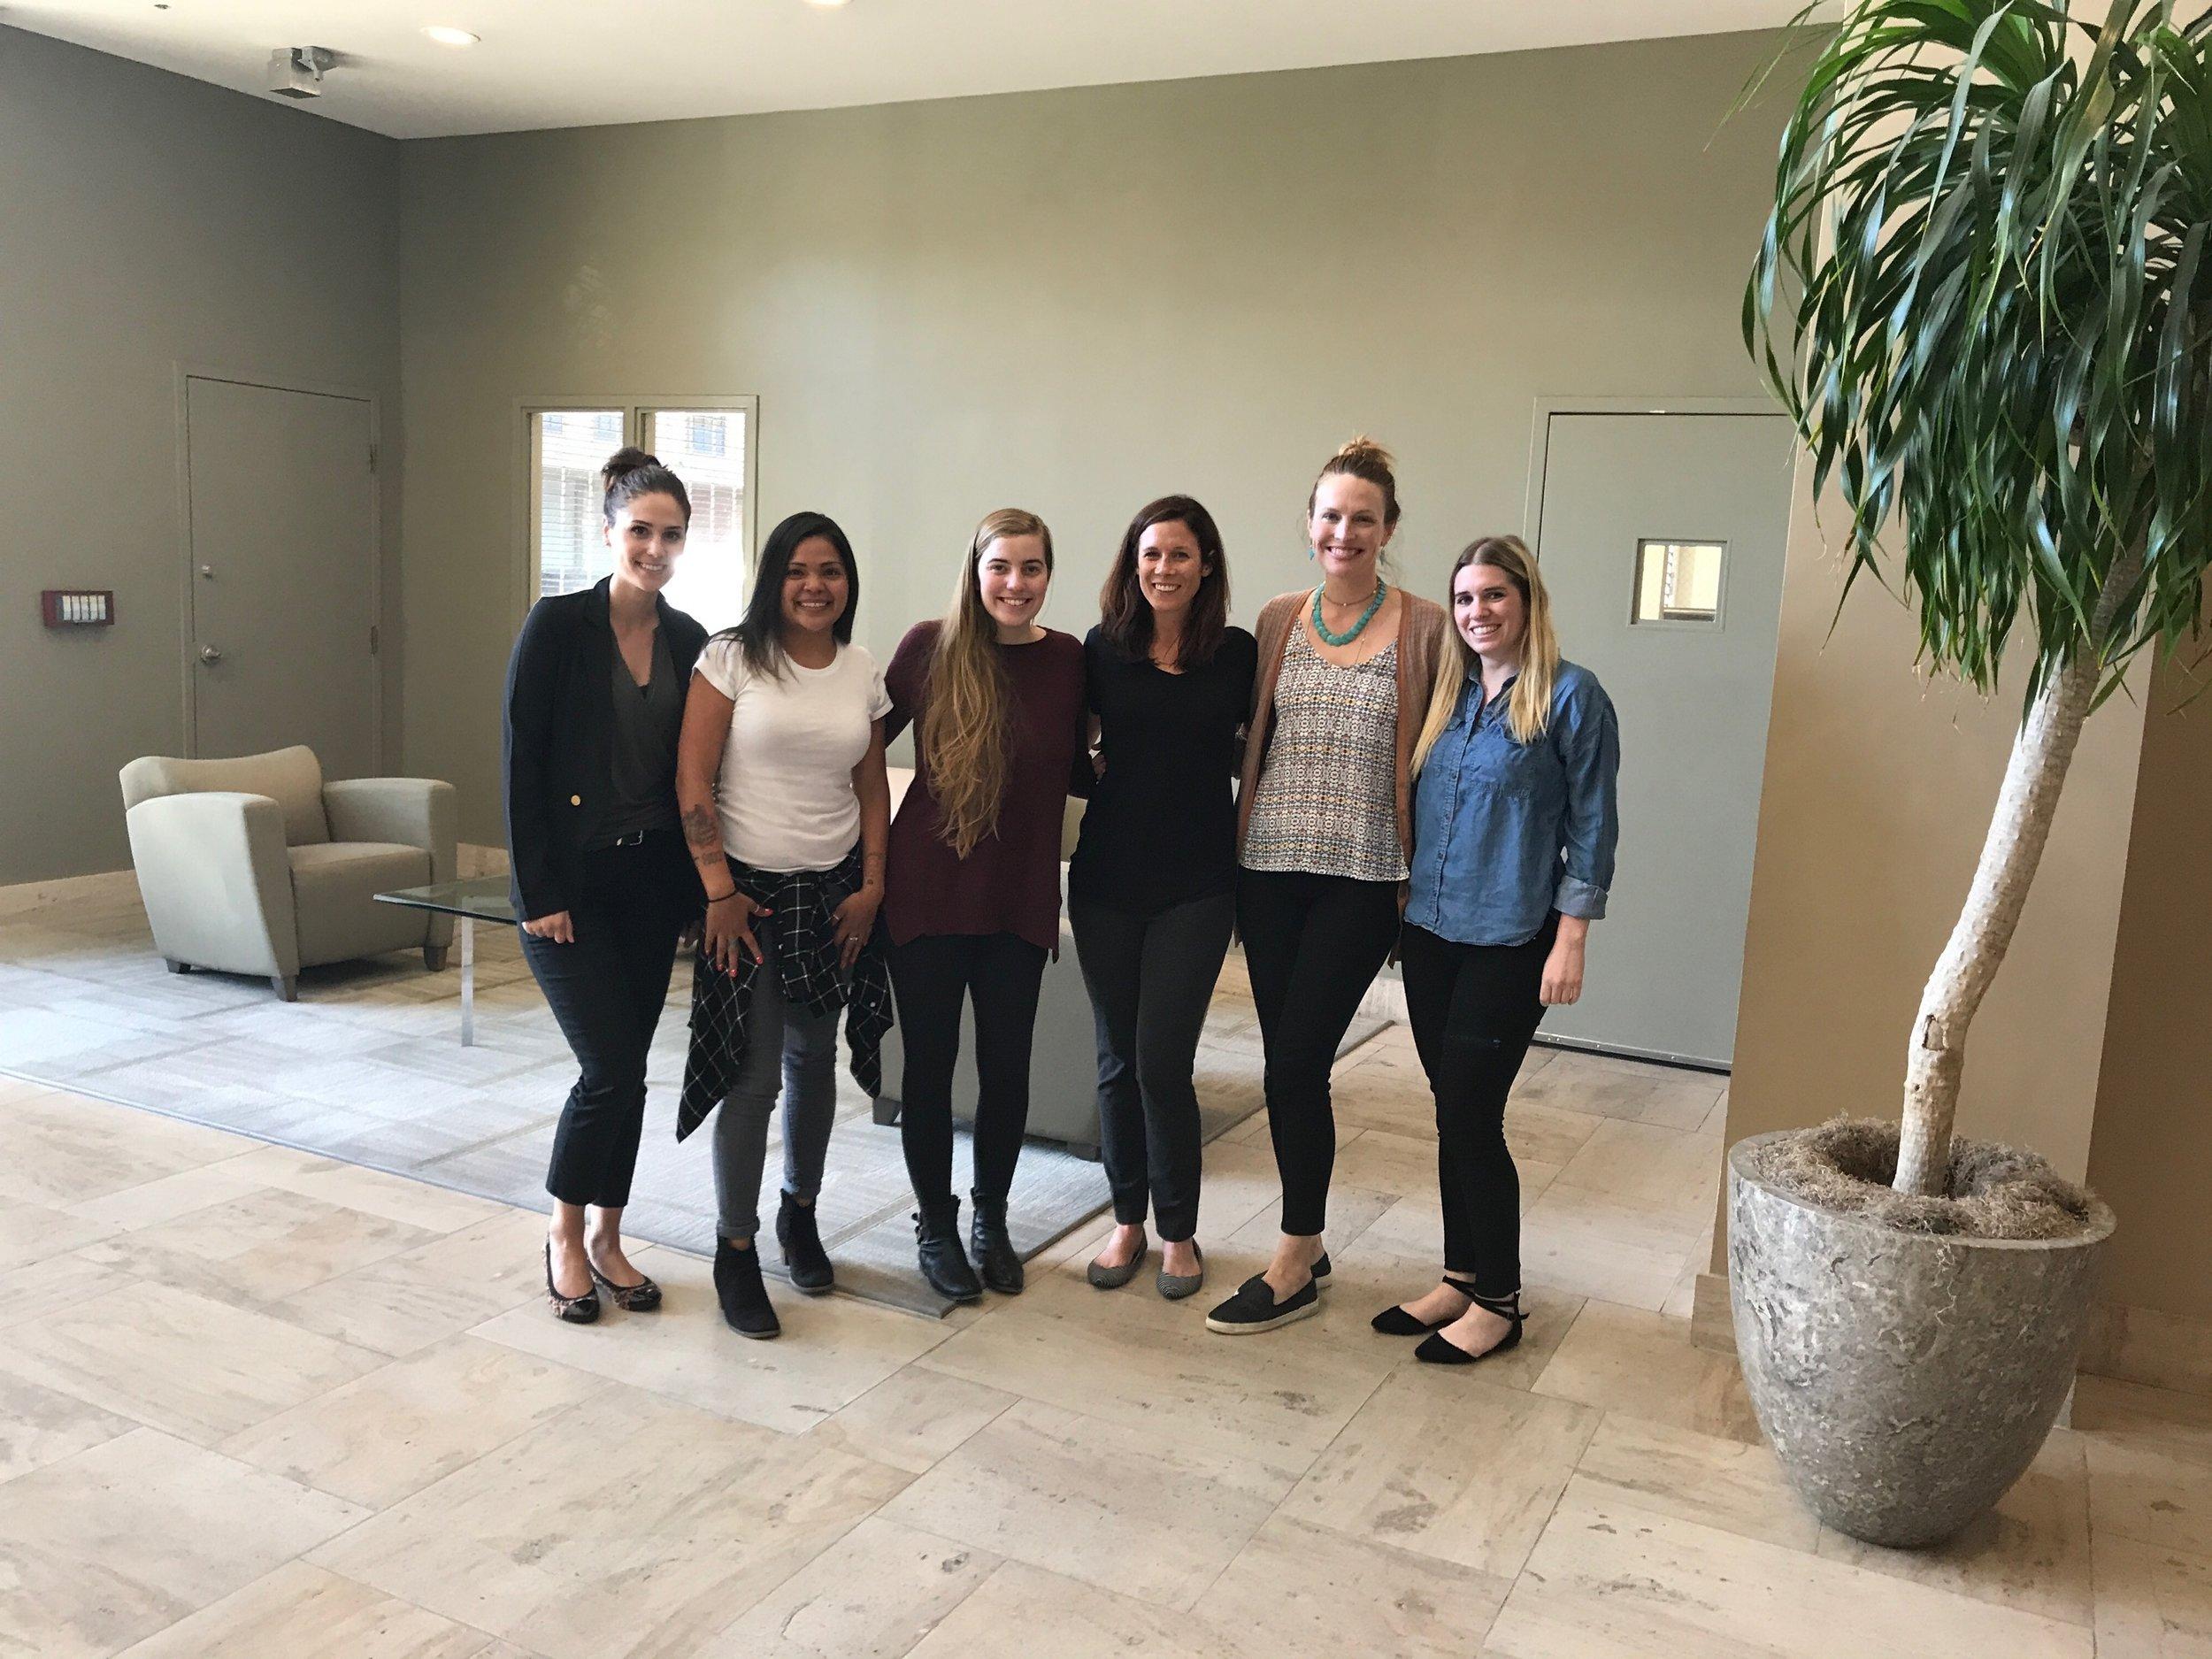 Heather (volunteer), Margarita (office coordinator), Nicole (speech language pathologist), Jody (speech language pathologist), Melissa (audiologist), McKenna (audiology doctoral student)